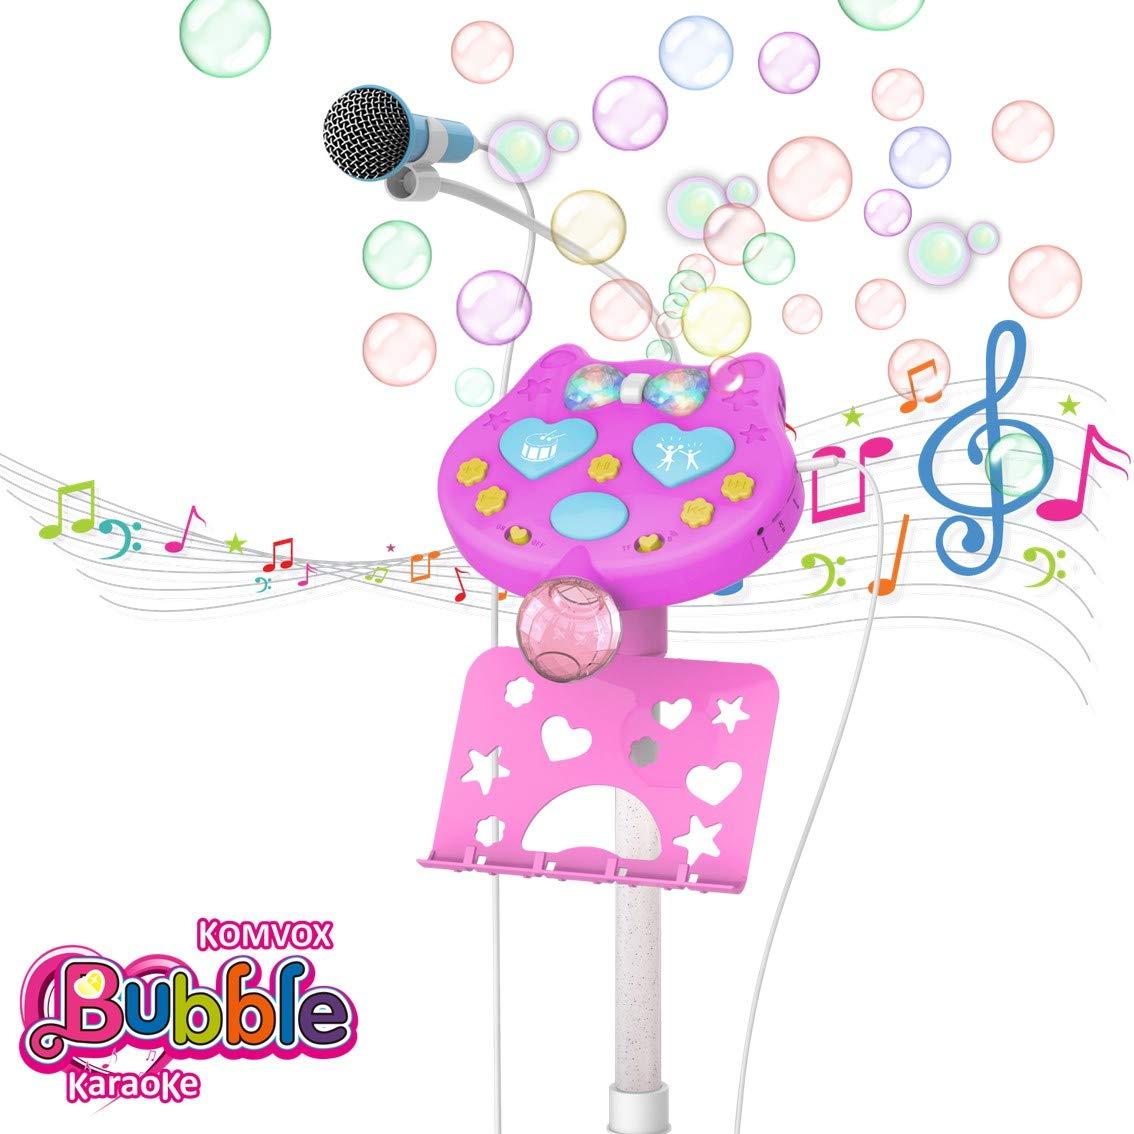 Regali Di Natale Bimbo 7 Anni.Komvox Bambini Karaoke Microfono Bolla Macchina Microfono Canta Tu